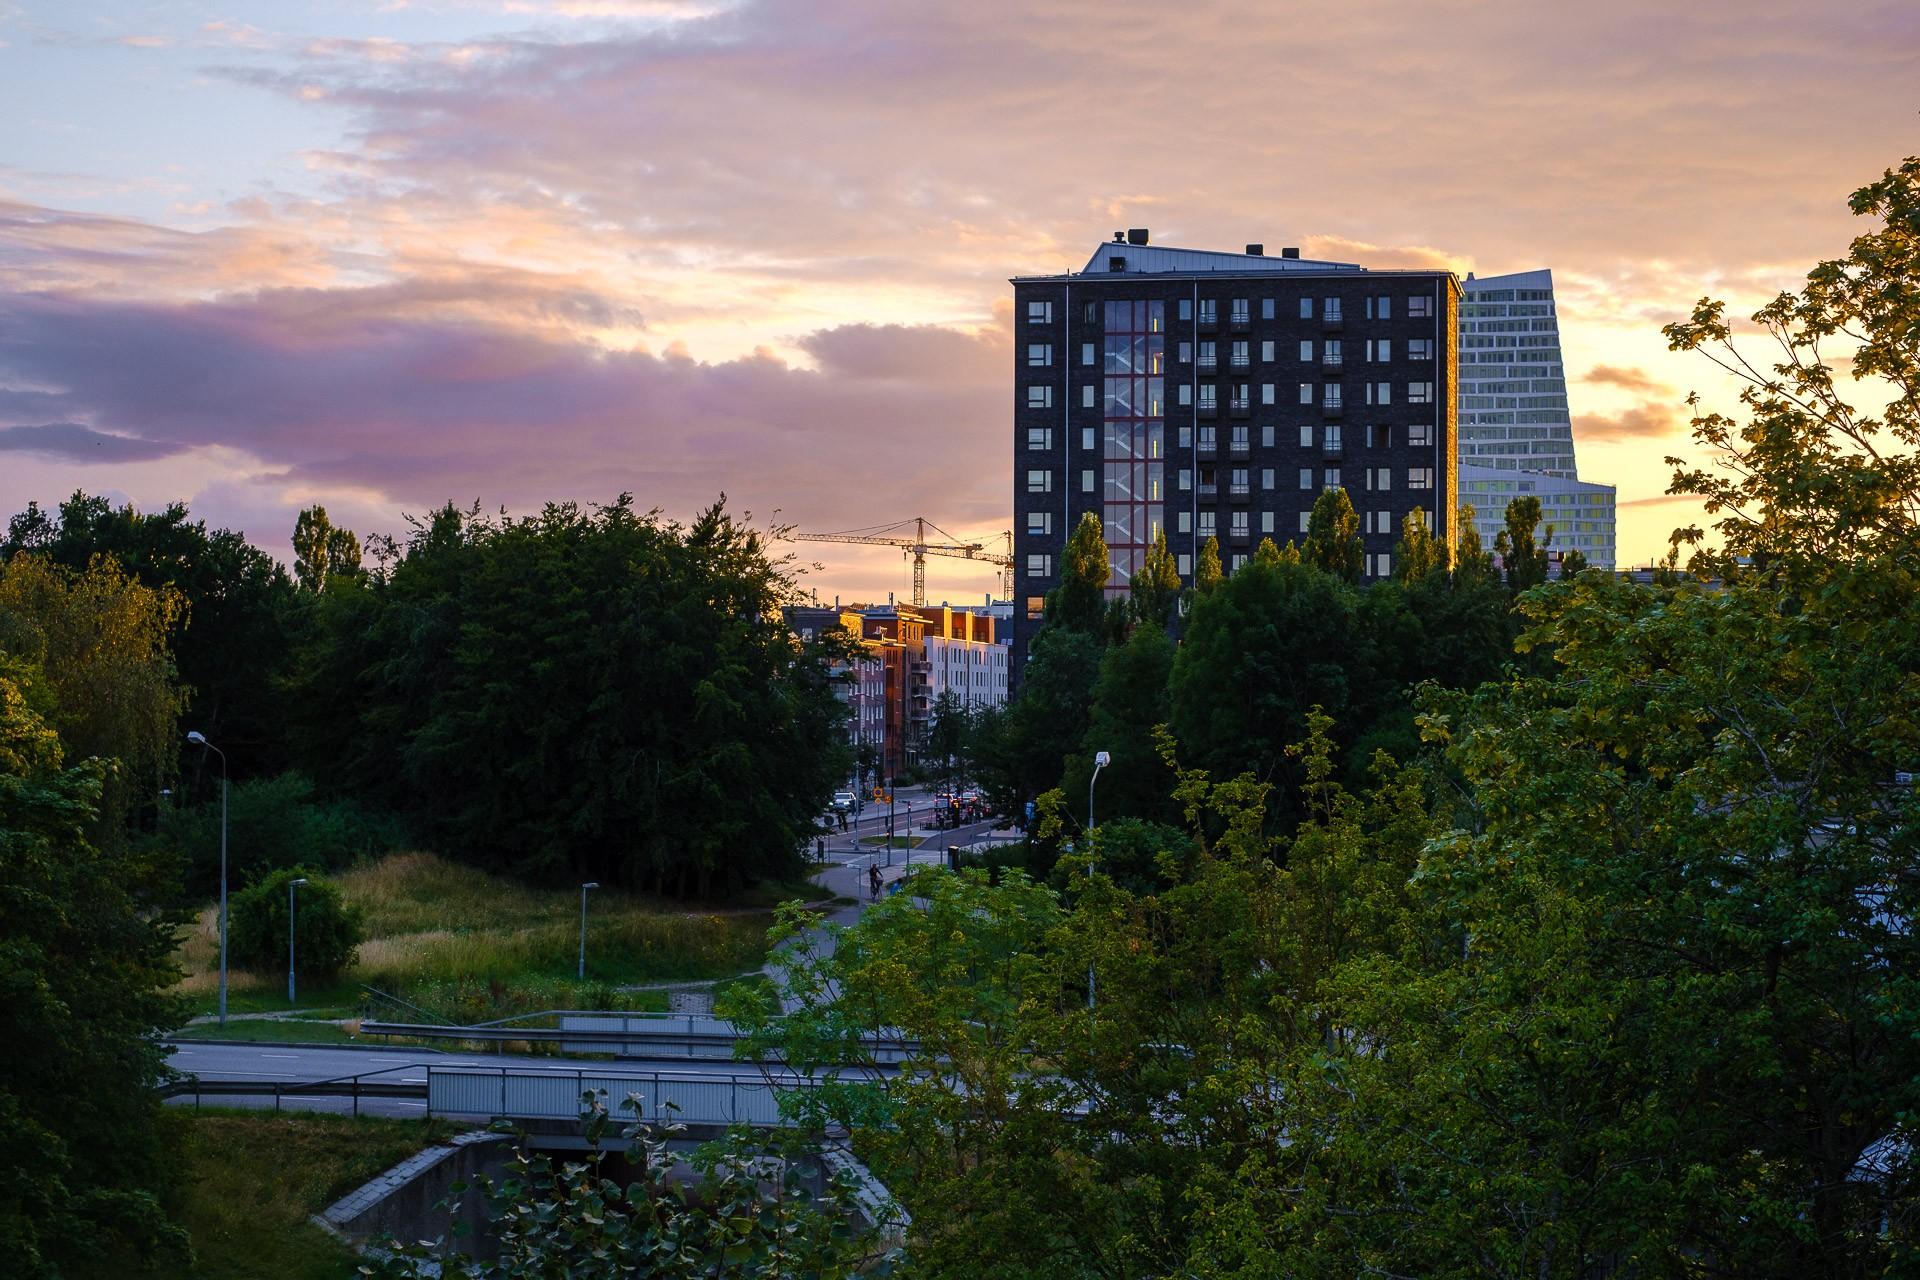 Solnedgång över Hyllie